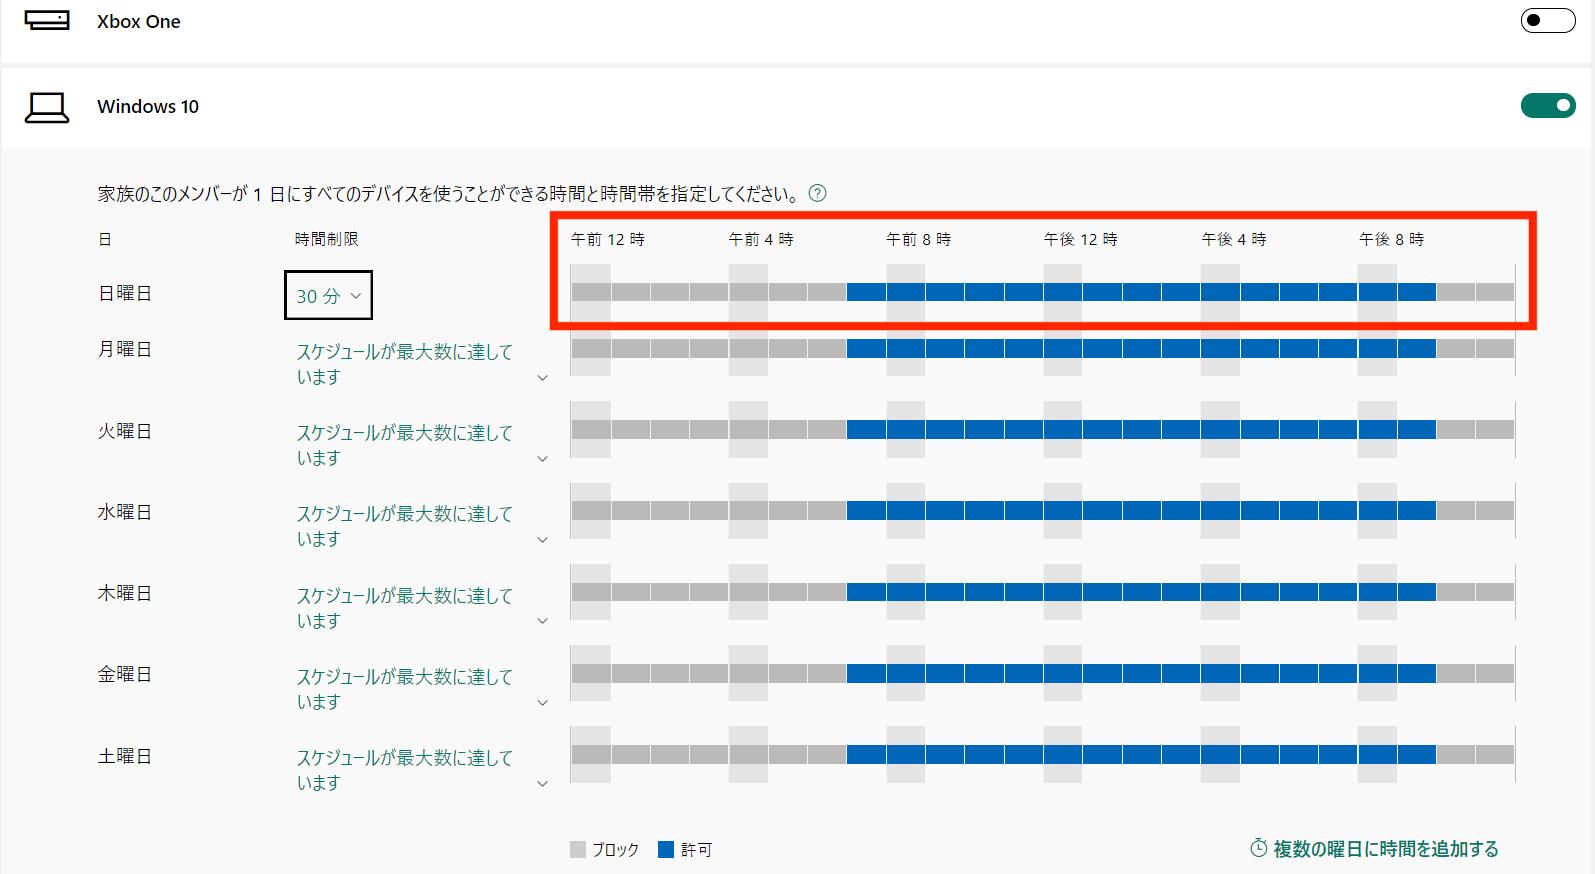 【Windows】ファミリー機能の使い方8